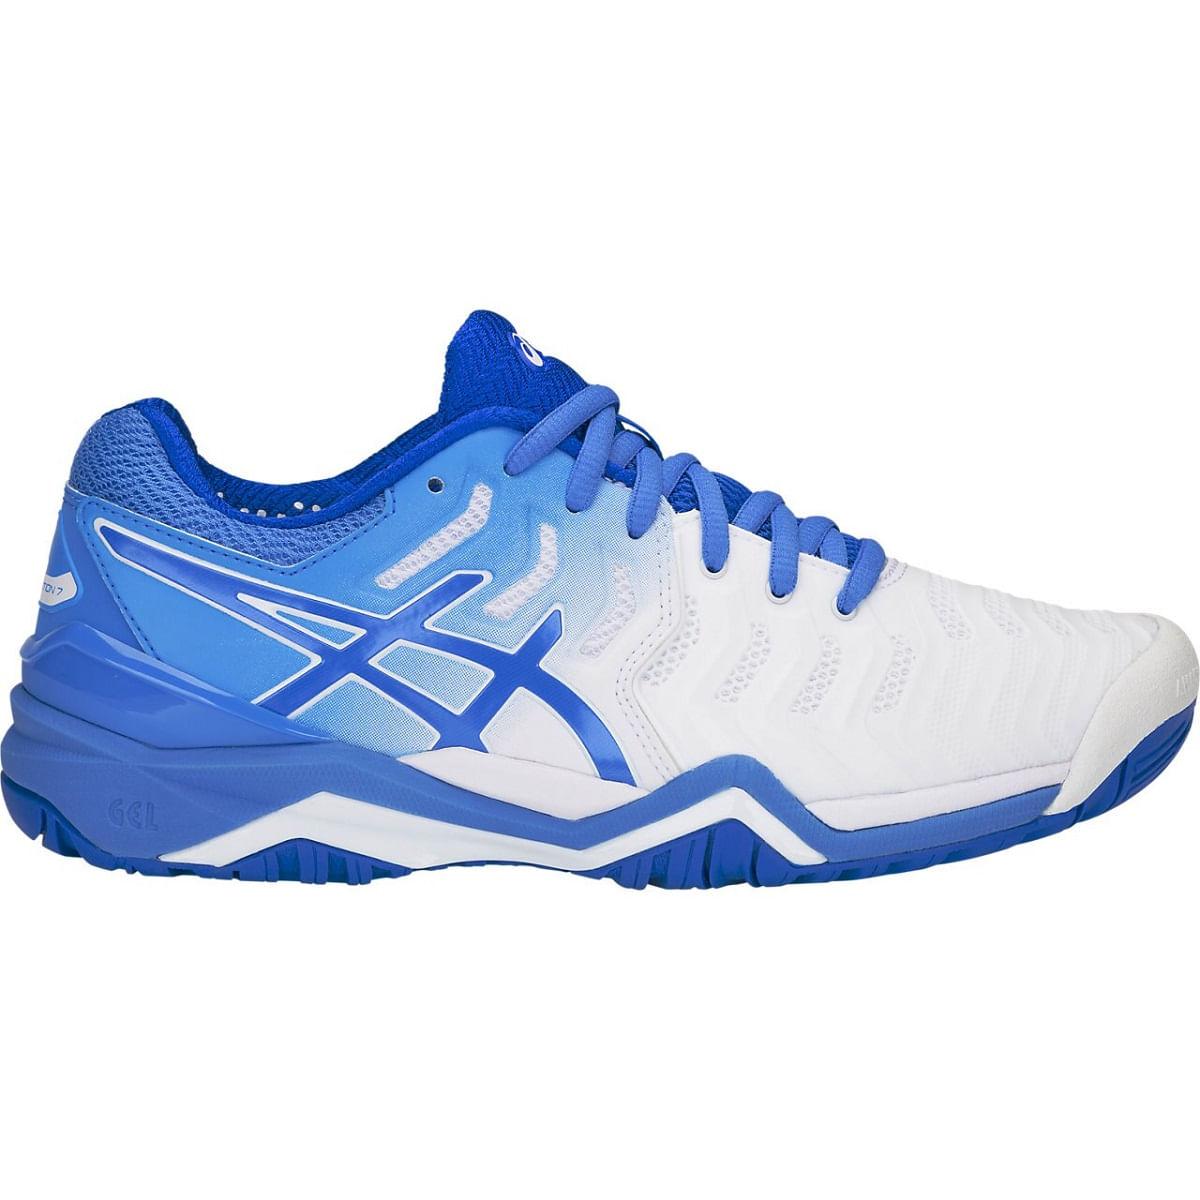 Tenis-Asics-GEL-RESOLUTION-7---Azul-e-Branco